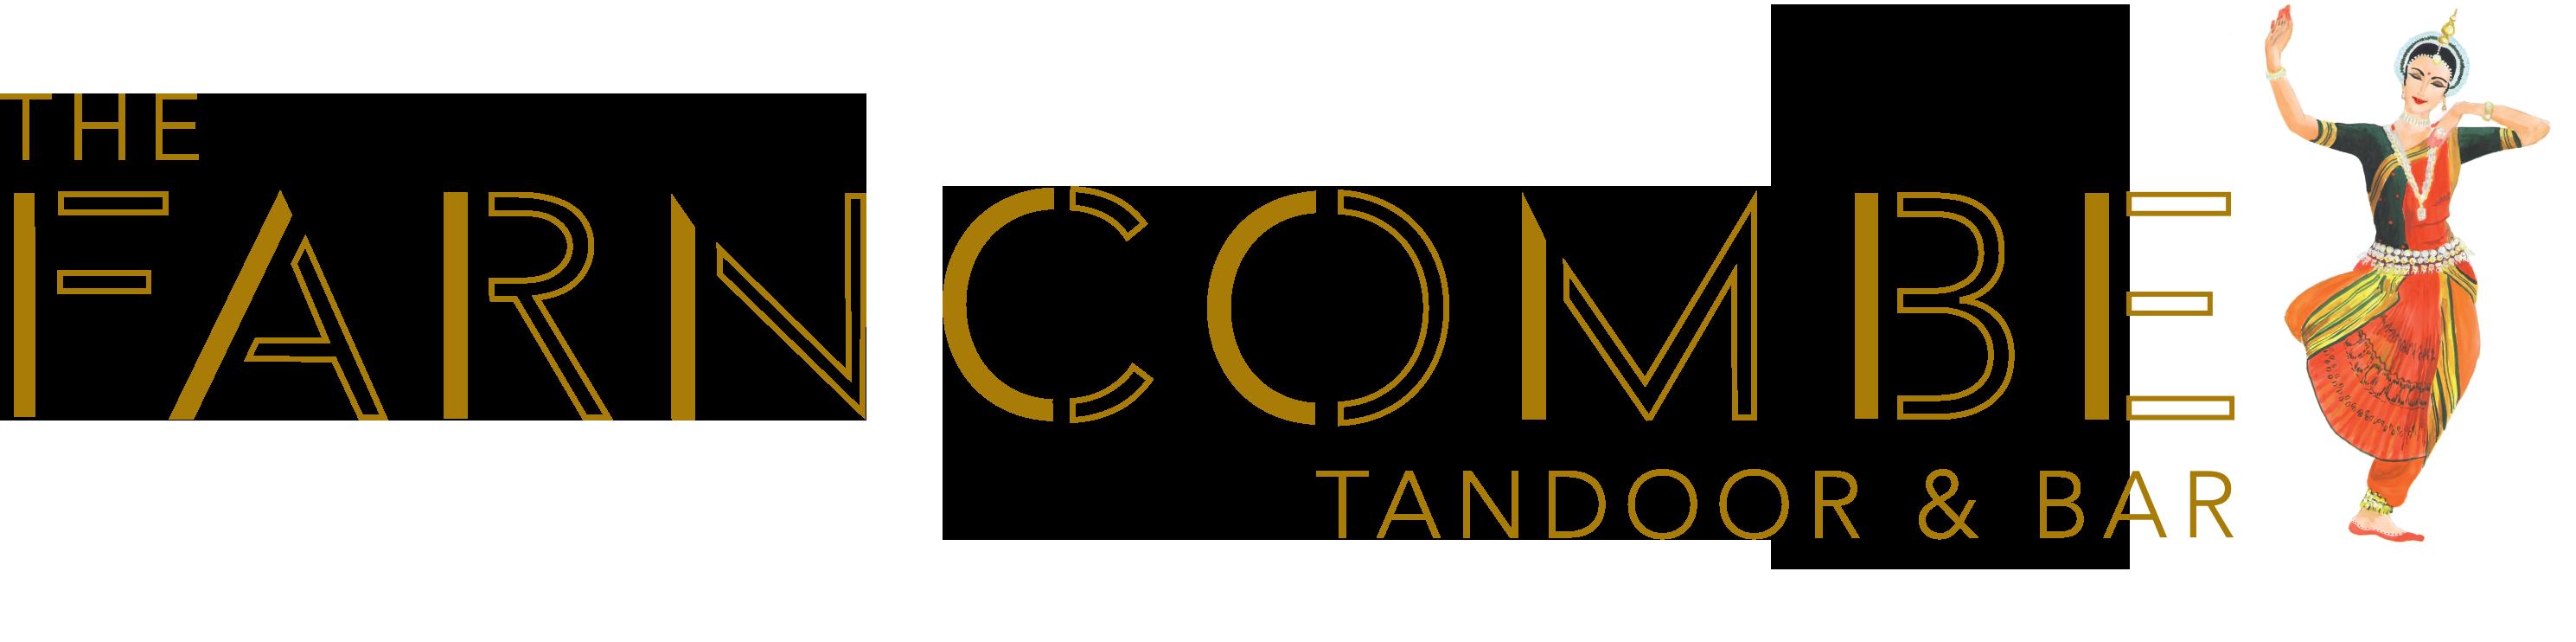 Farncombe Tandoori